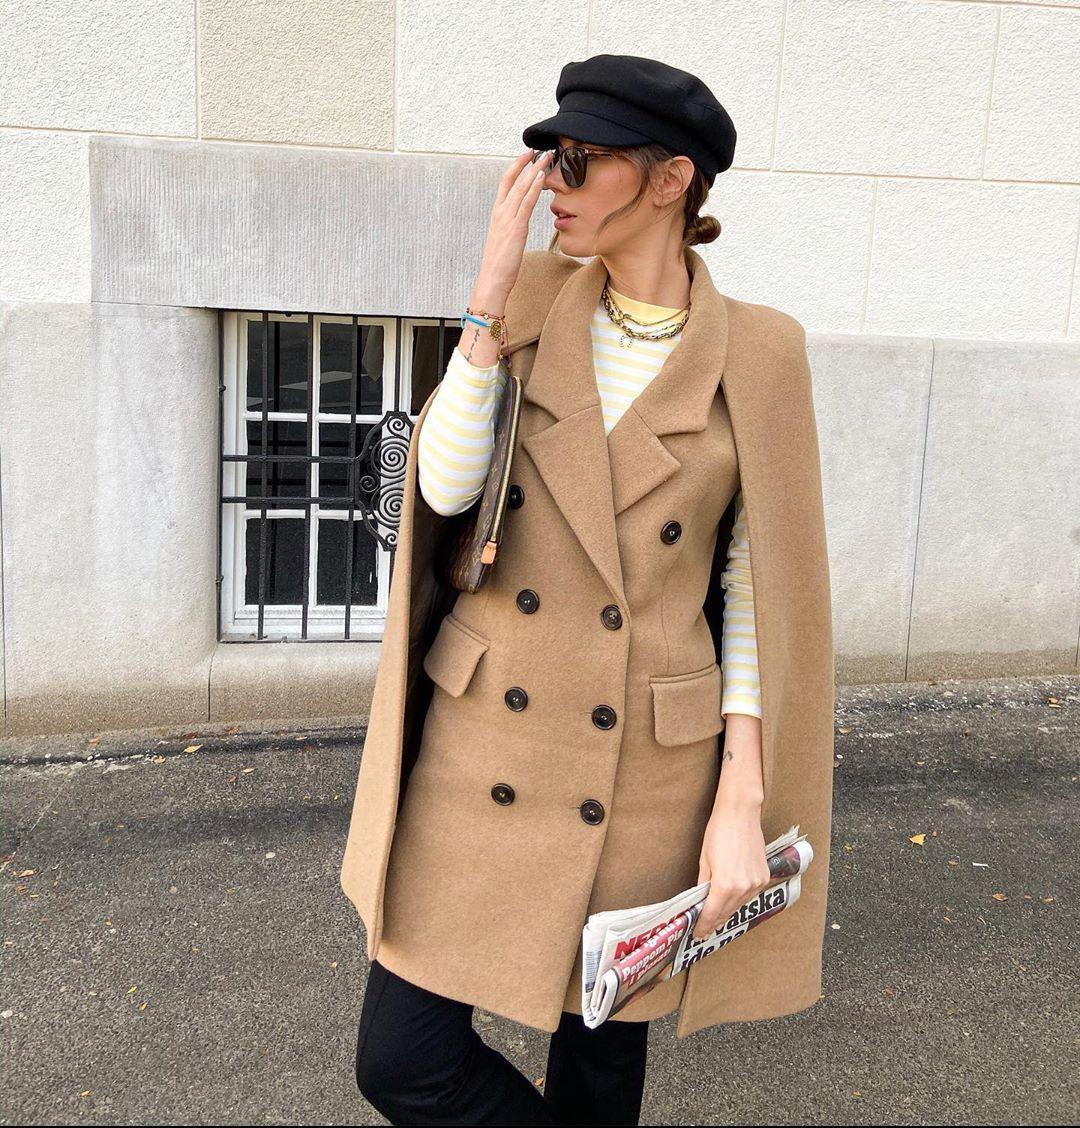 Klasične kapute zamijenite elegantnom pelerinom! Izdvojili smo predivne modele iz ponude